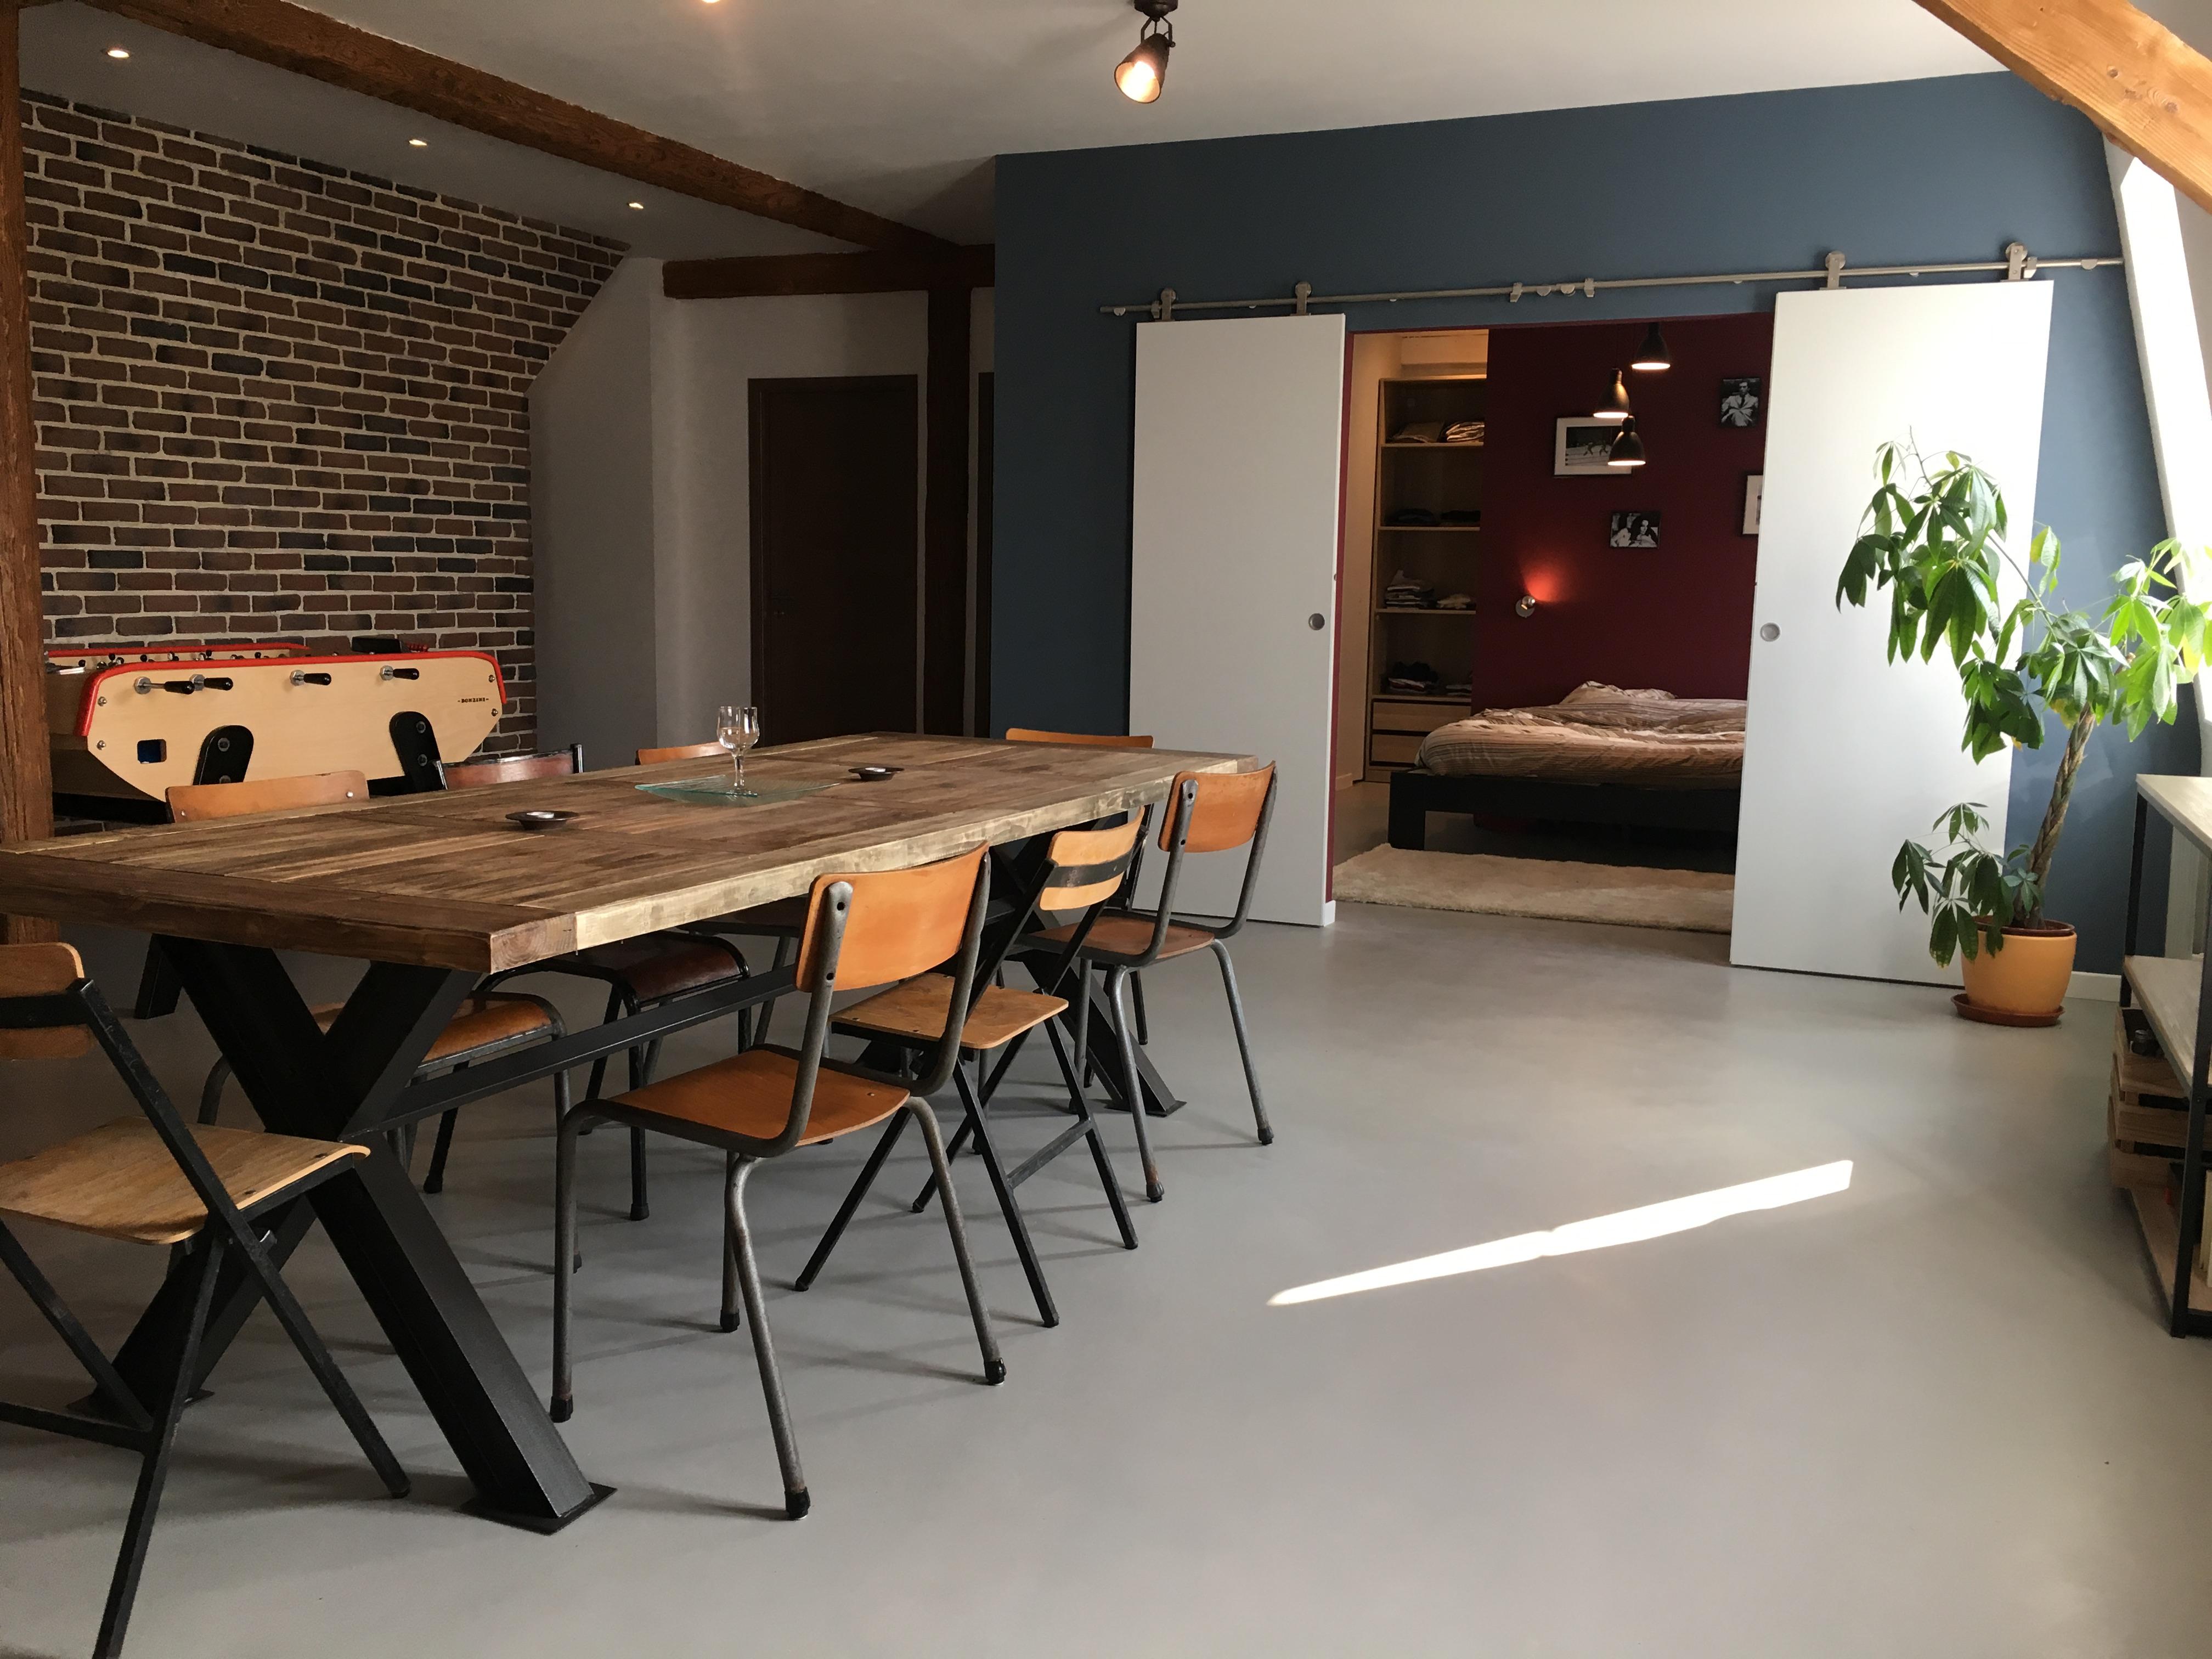 Béton Ciré Plan De Travail Cuisine Leroy Merlin Inspirant Galerie Couleur De Beton Cir 61 Avec Nos R Alisations De B ton Cir Mortier